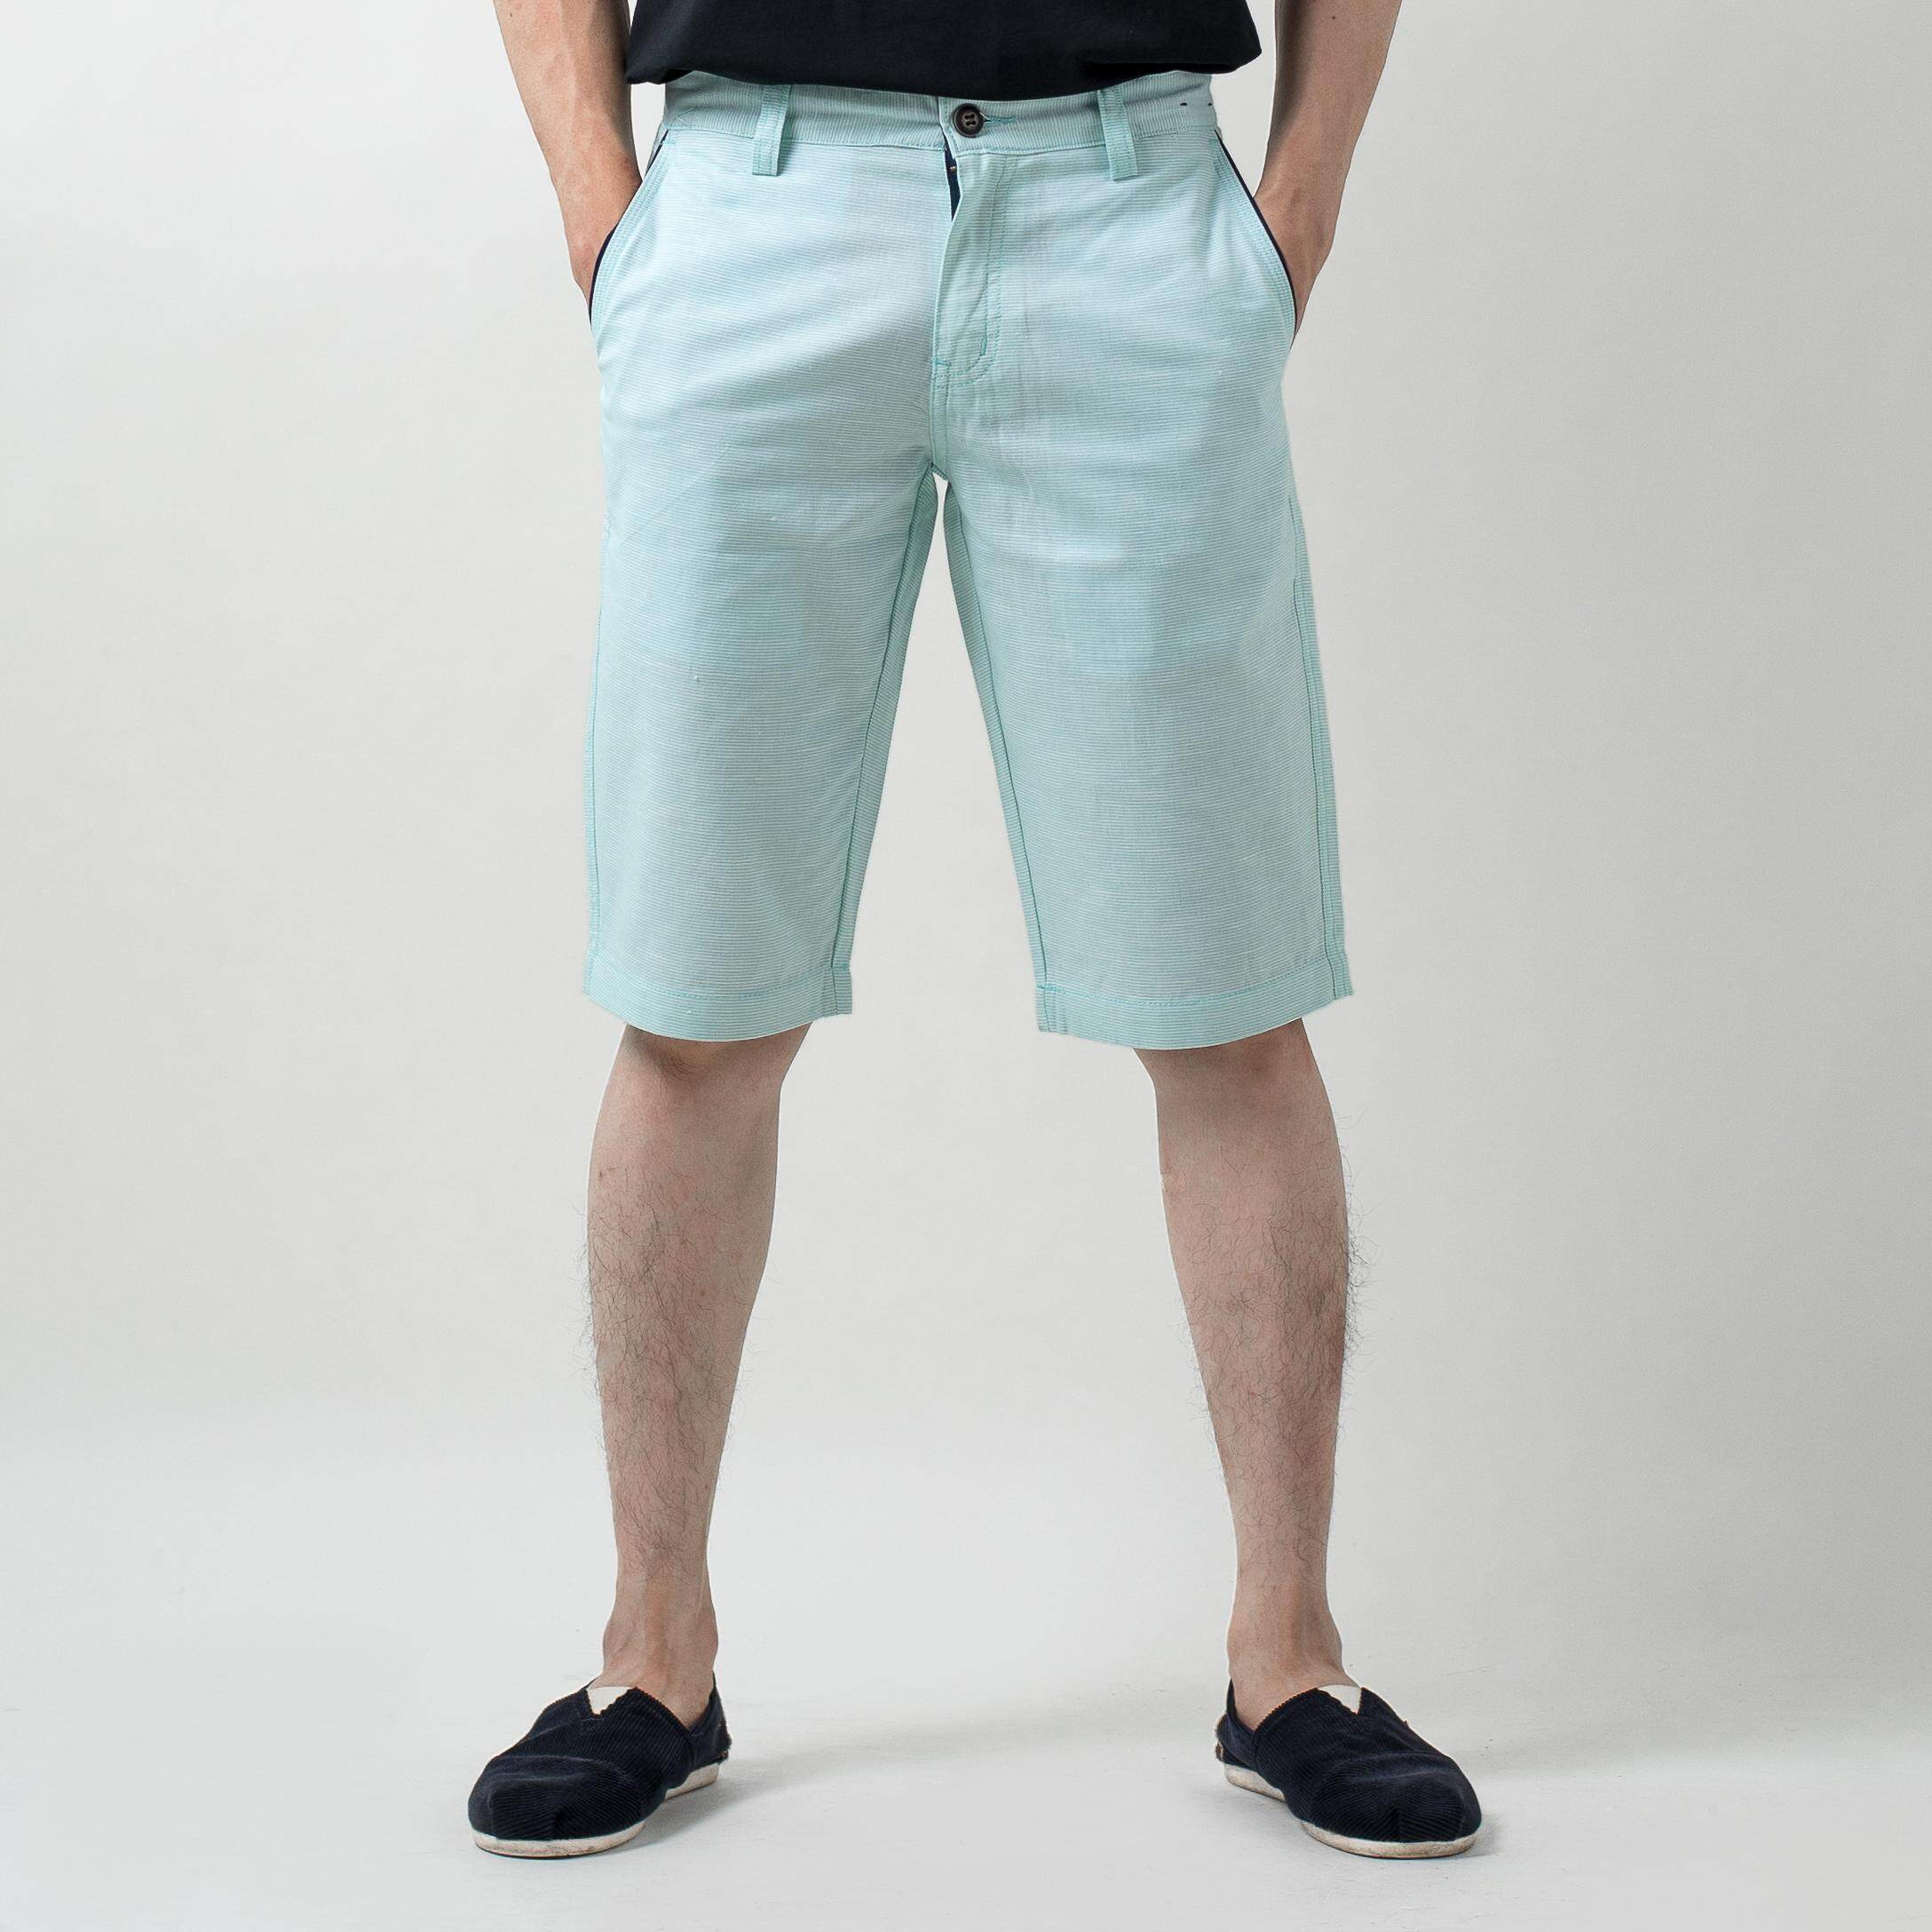 MEN'S CHINO SHORT PANTS PLAIN B49-51546-SSL#1#2